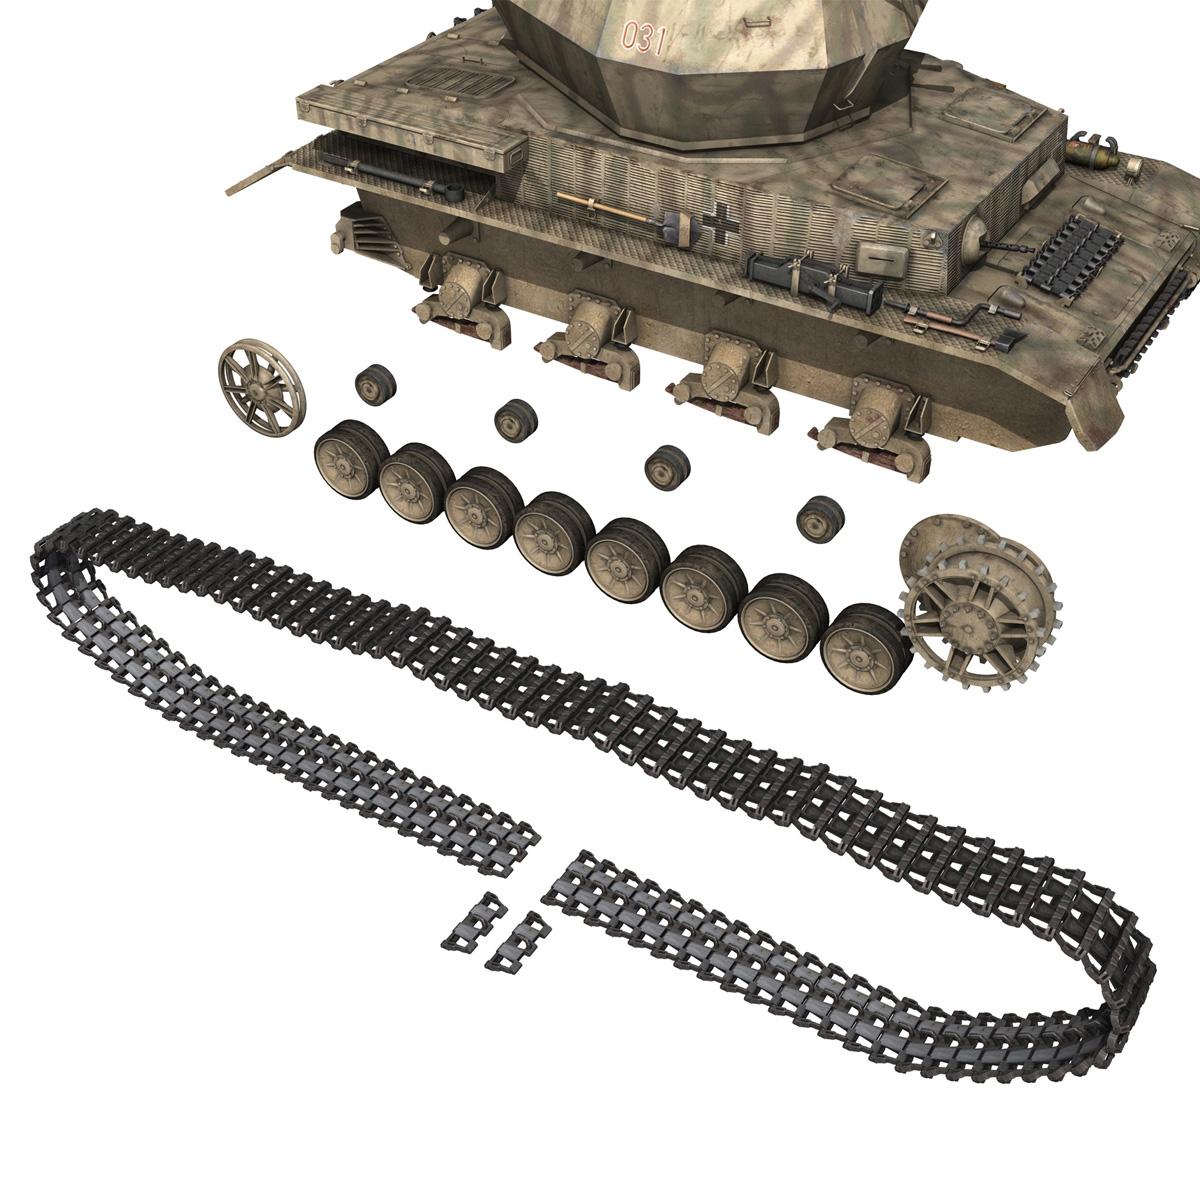 flakpanzer iv – wirbelwind 3d model 3ds fbx c4d lwo obj 191506